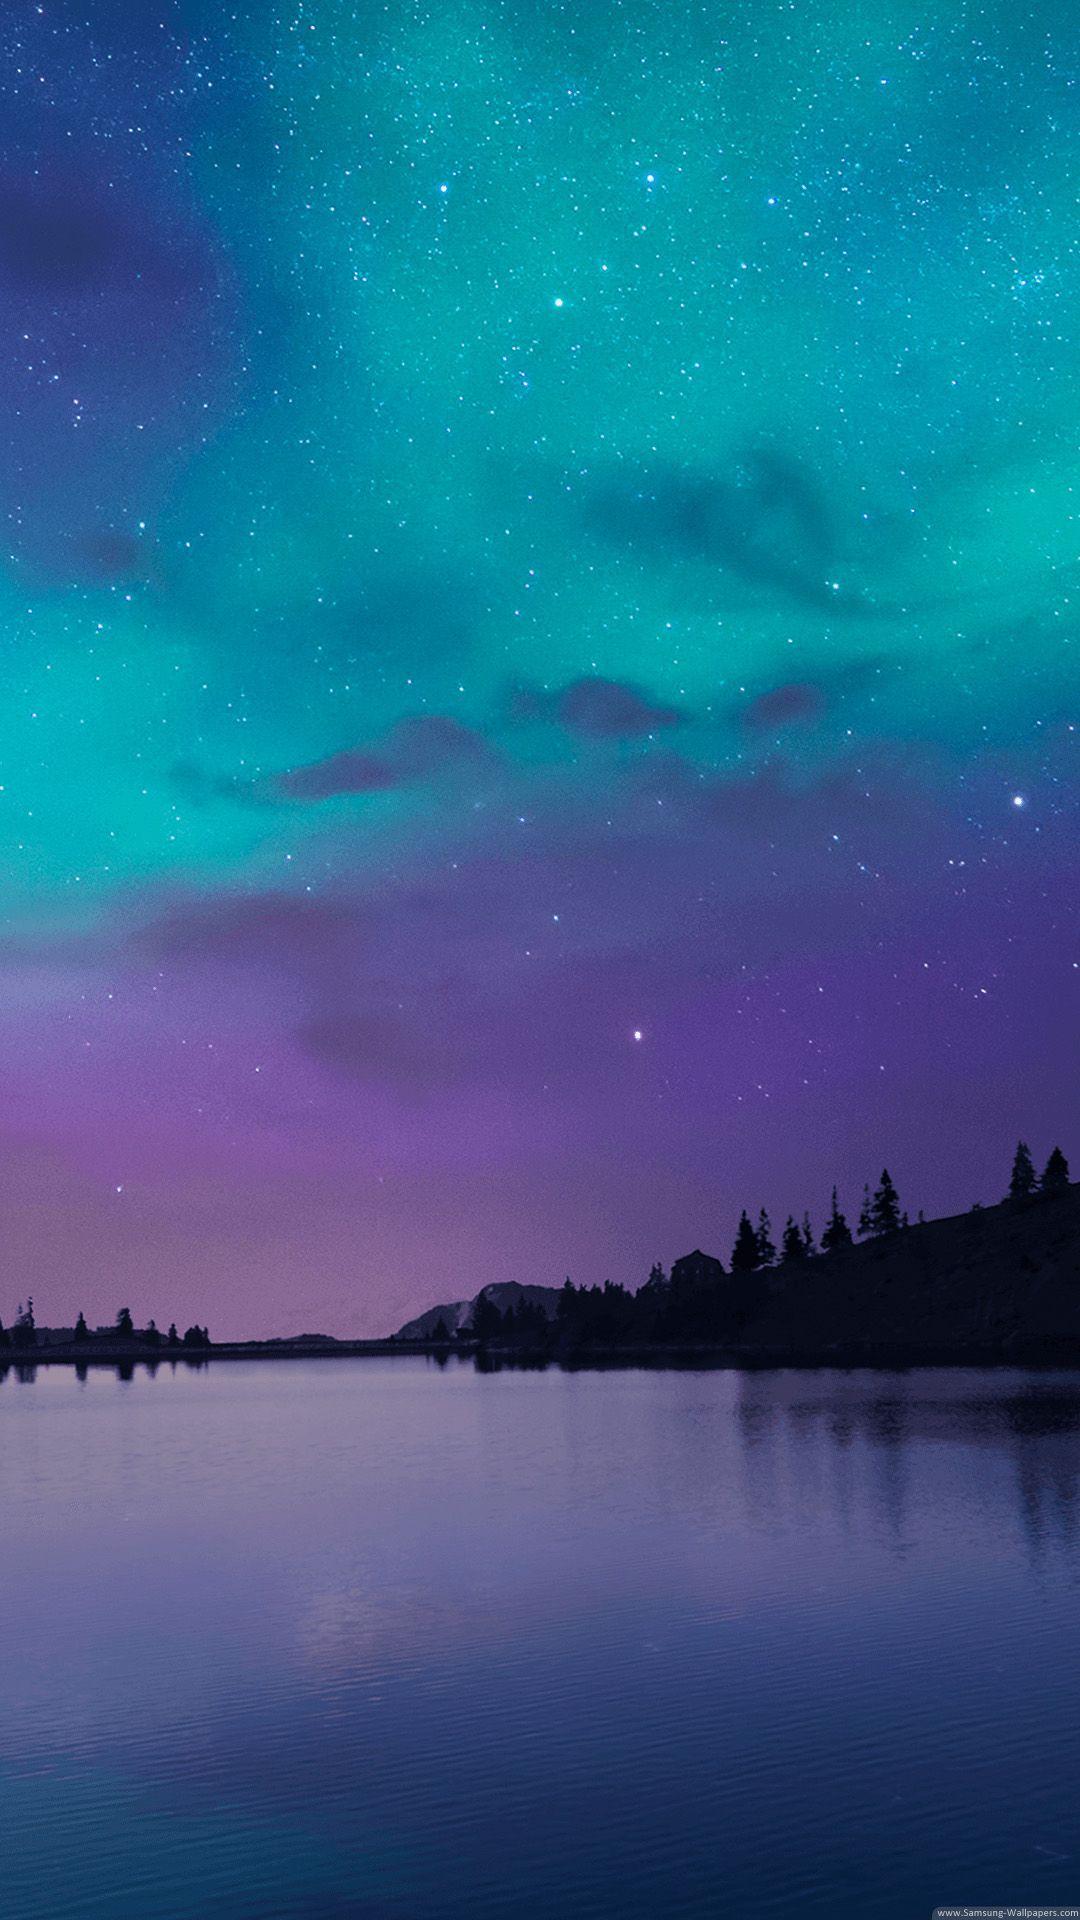 Natural Night Lock Screen in 2020 Night sky wallpaper